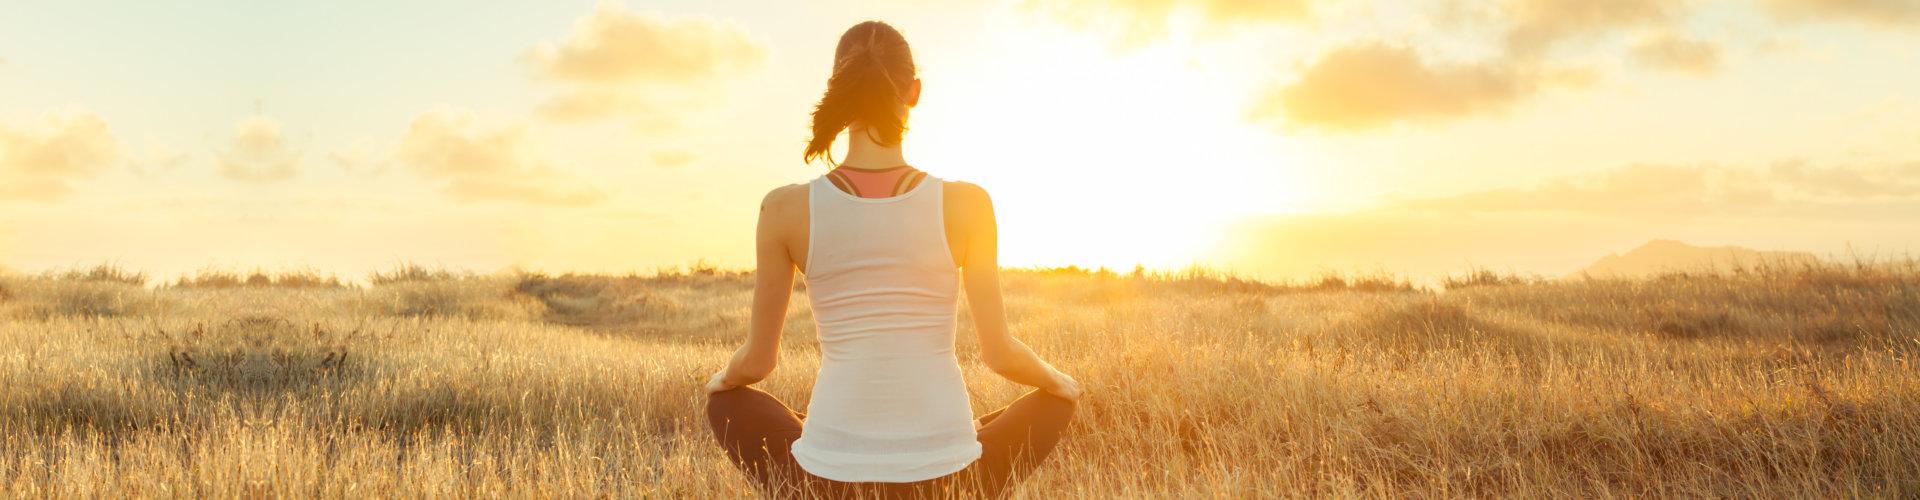 Meditation, yoga, feeling at peace